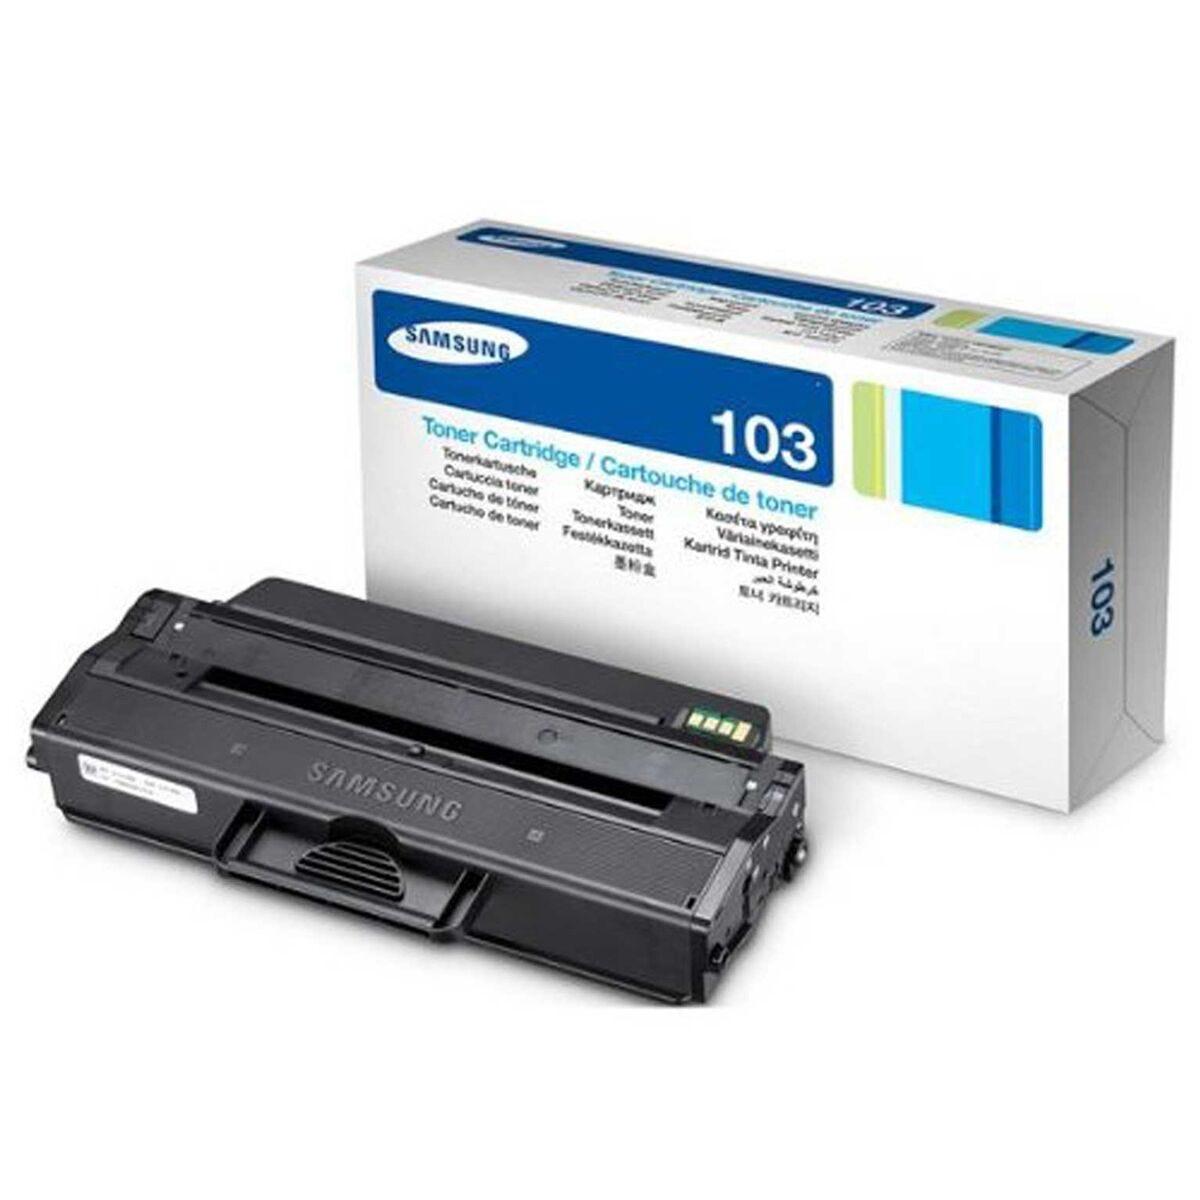 Samsung  MLT-D103S Printer Toner Cartridge